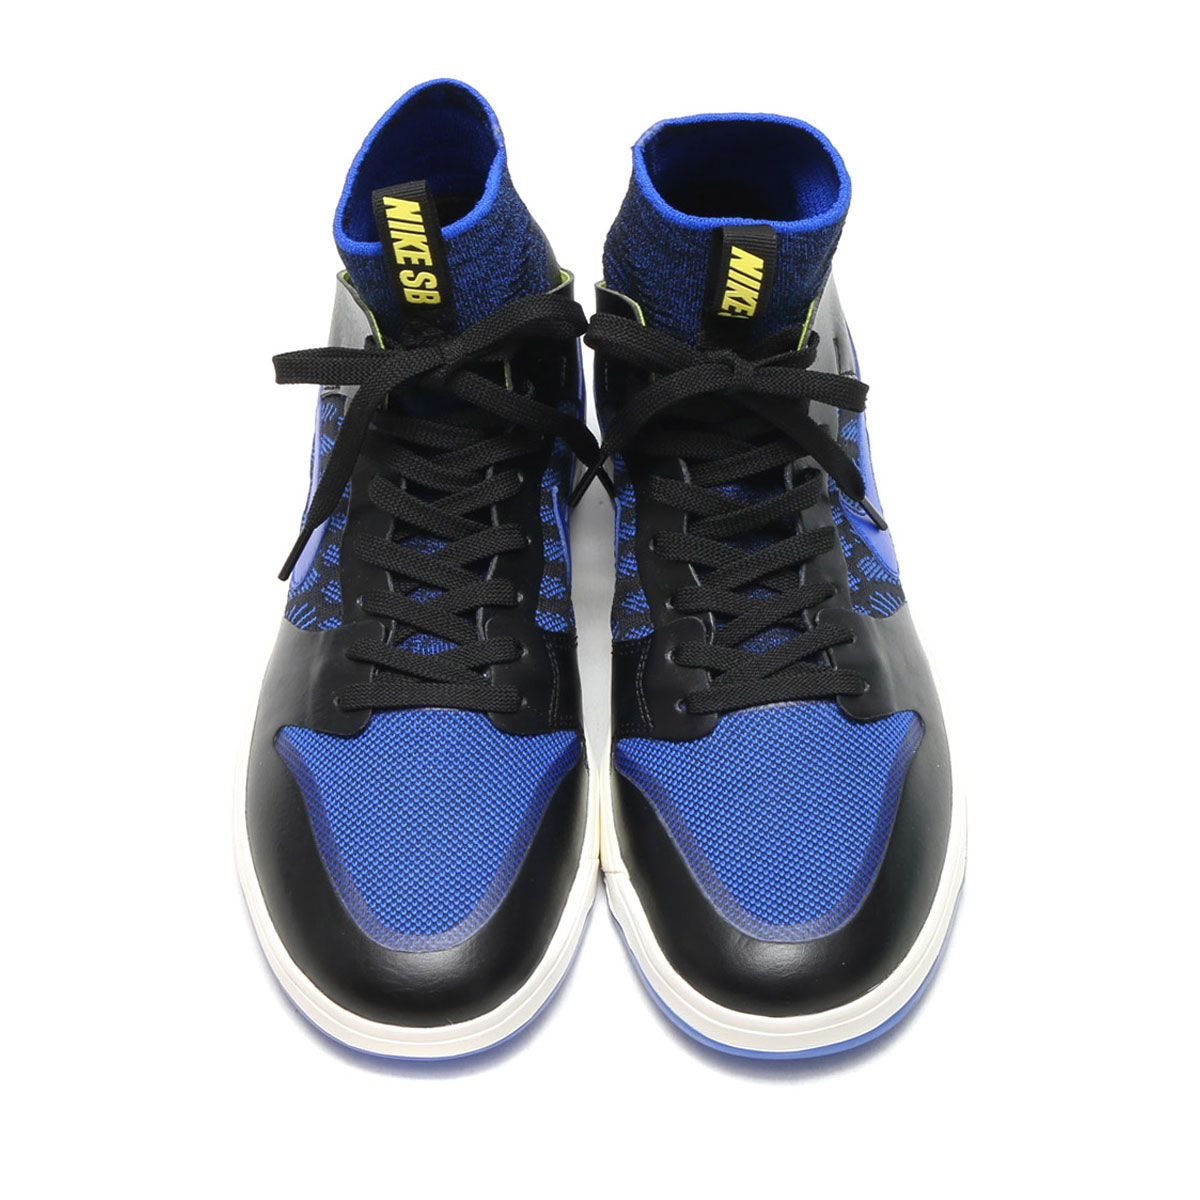 af10dea4d021 NIKE SB ZOOM DUNK HIGH ELT QS (BLACK RACER BLUE-SAIL-SONIC YELLOW) (Nike SB  zoom dunk high elite quick strike)